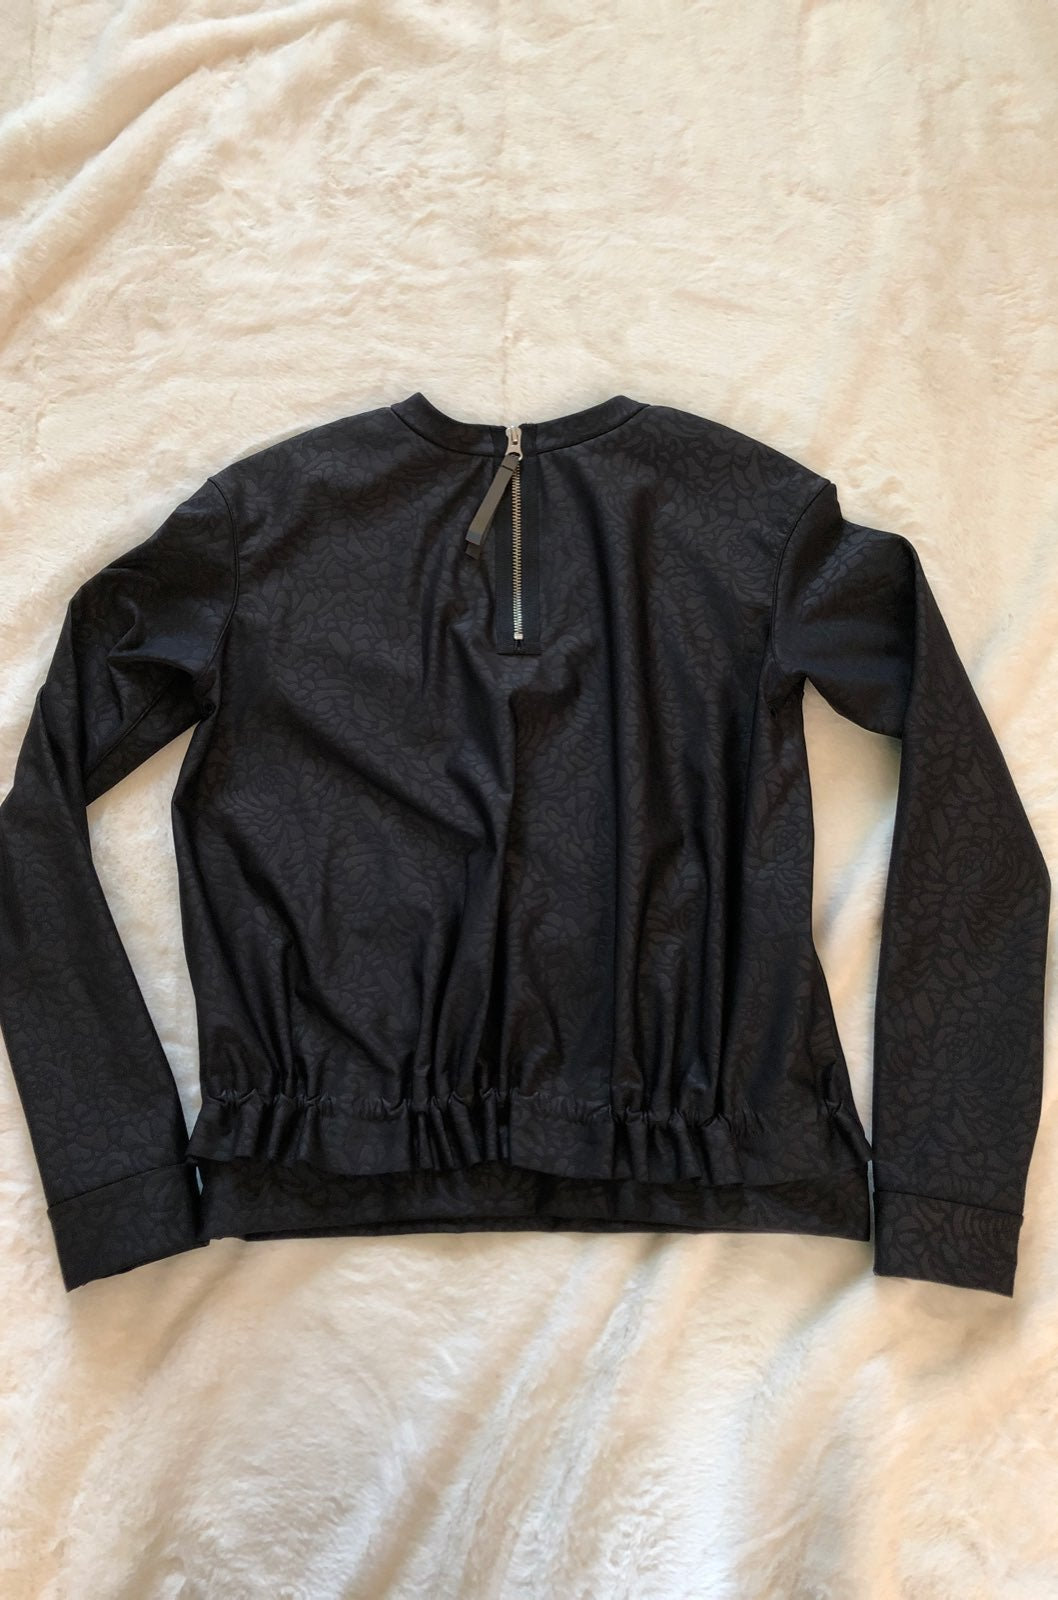 Lululemon pull over zip up jacket